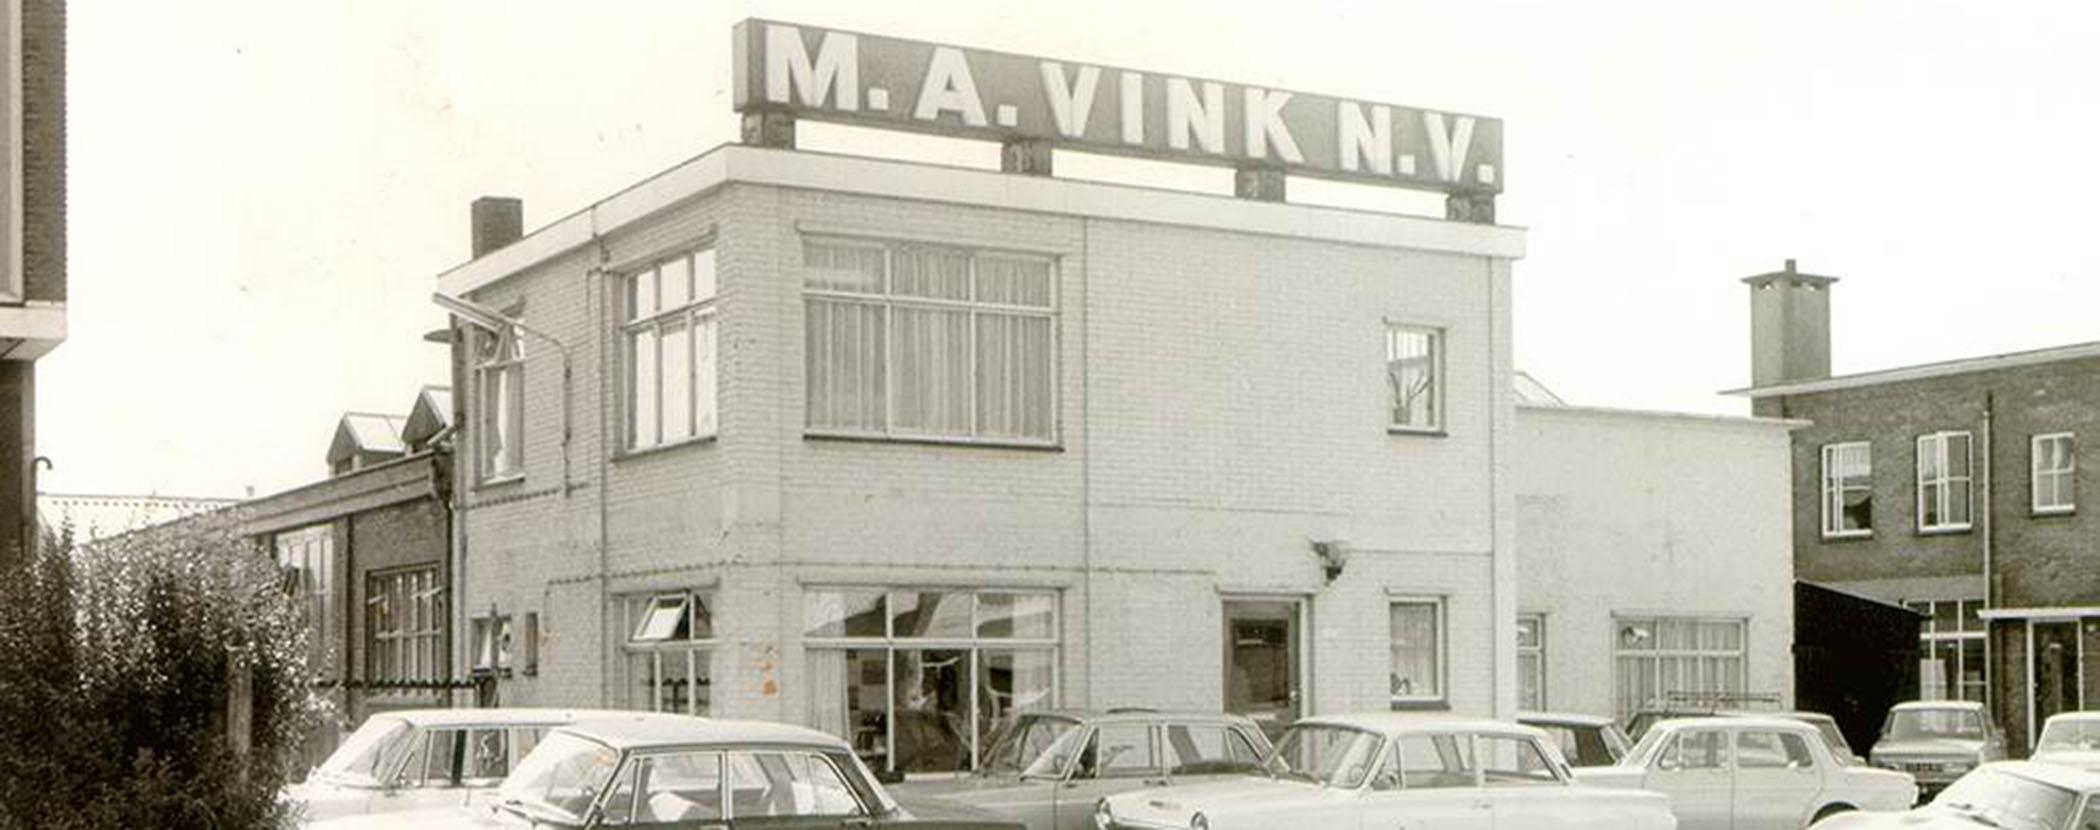 M-A vink fabrik